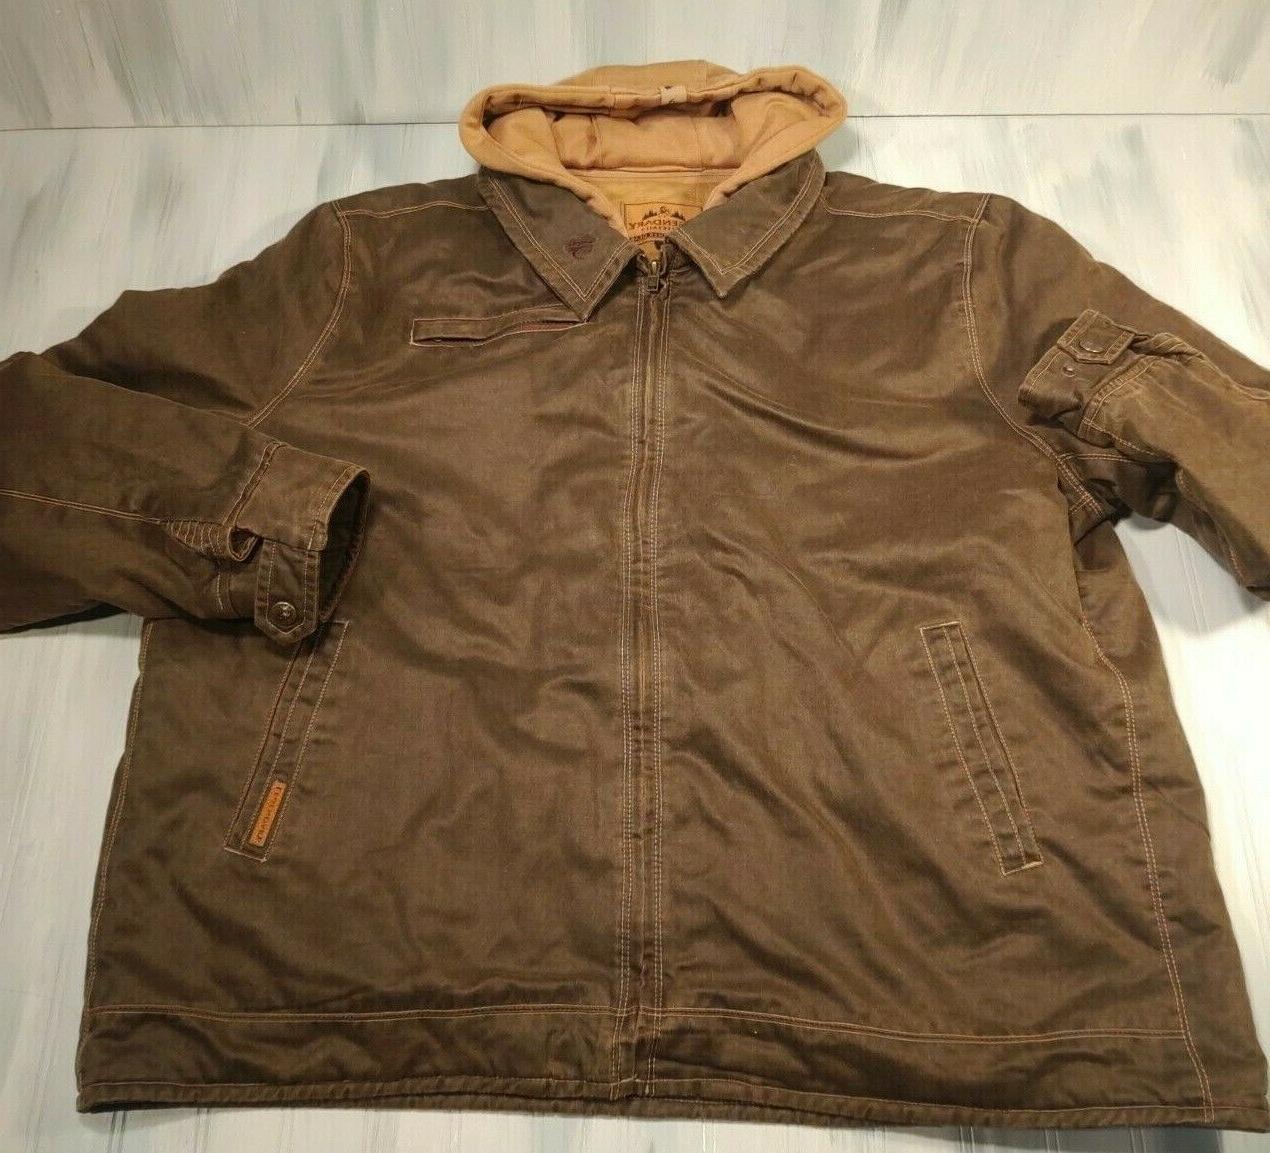 NWOT Legendary 2xl Rugged Full Dakota Jacket -